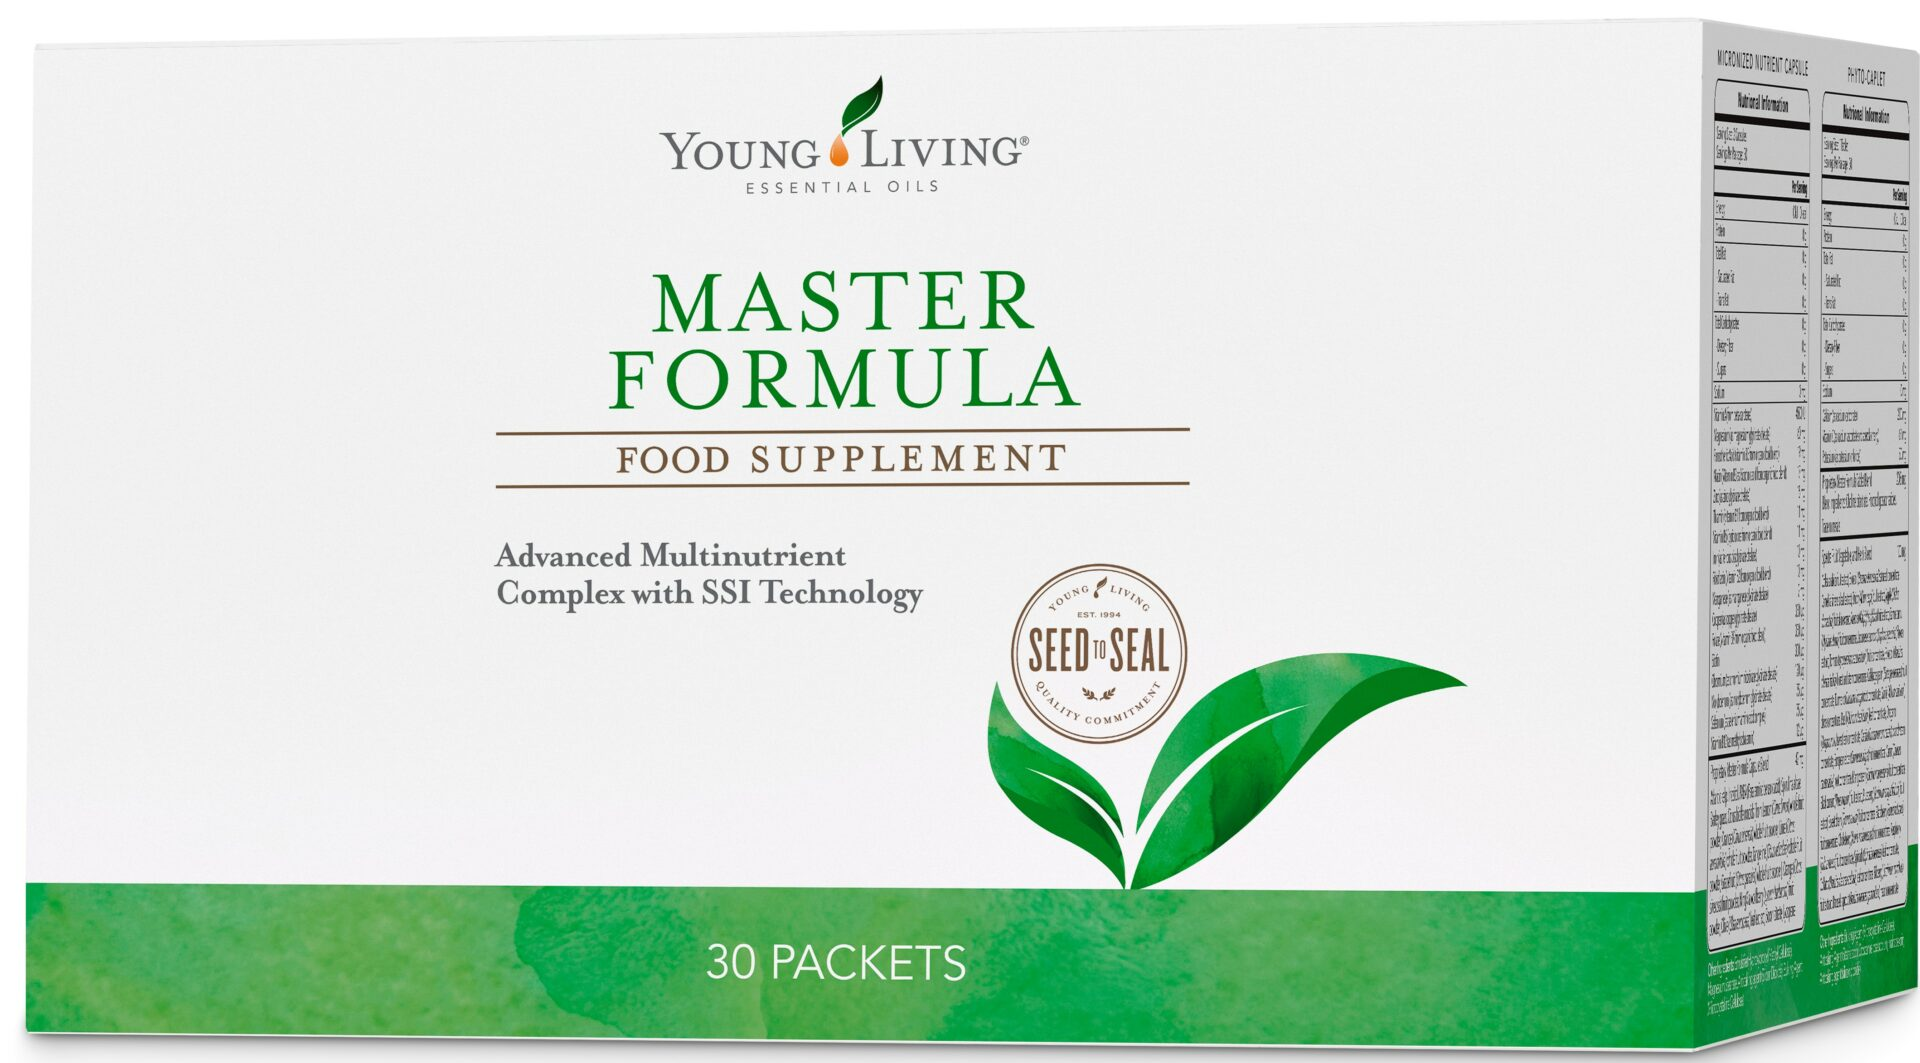 Master Formula - Young Living Essential Oils